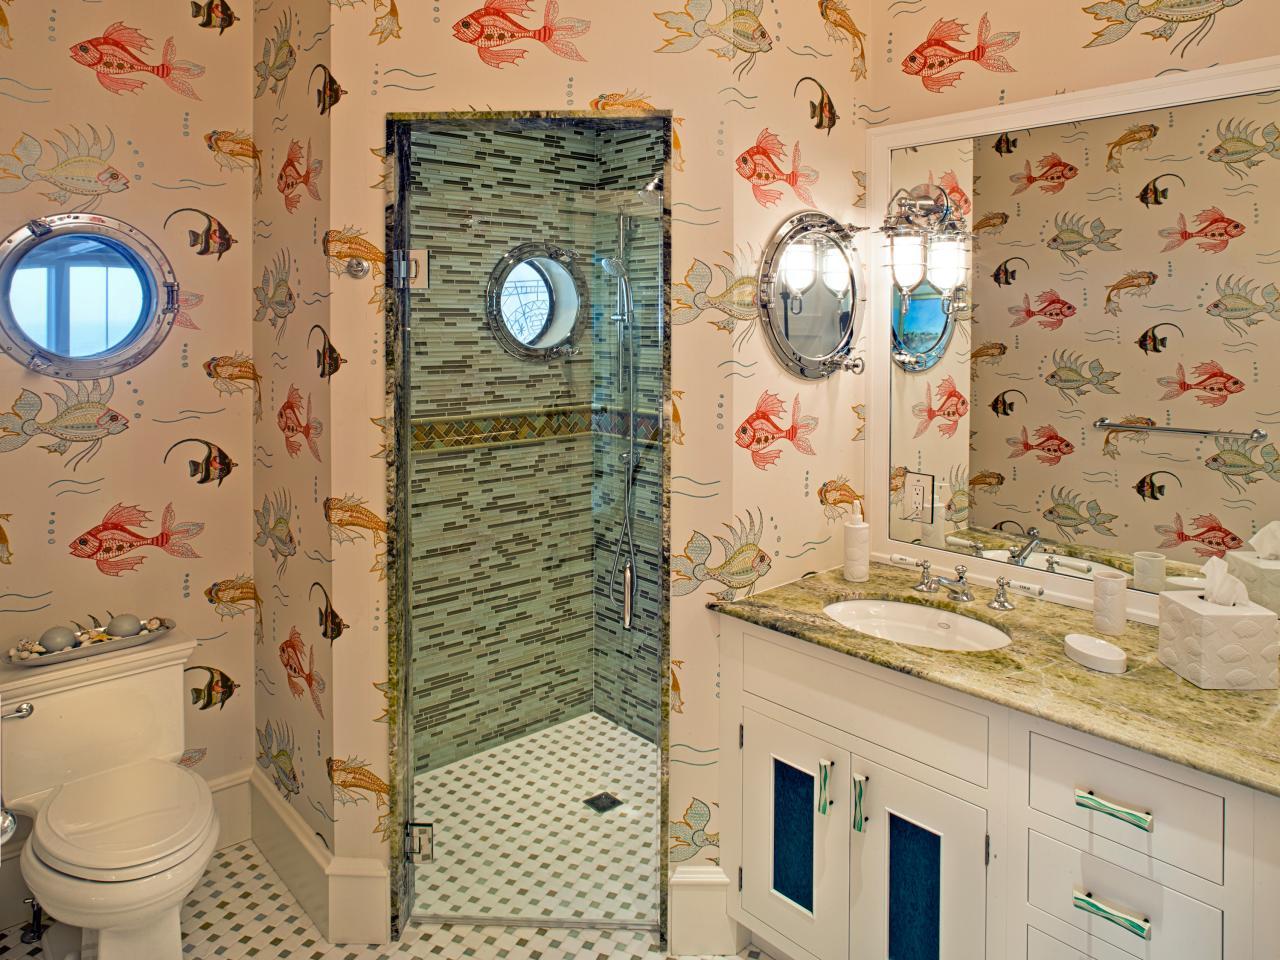 Remarkable Ocean Bathroom Fish, Fishing Themed Bathroom Decor